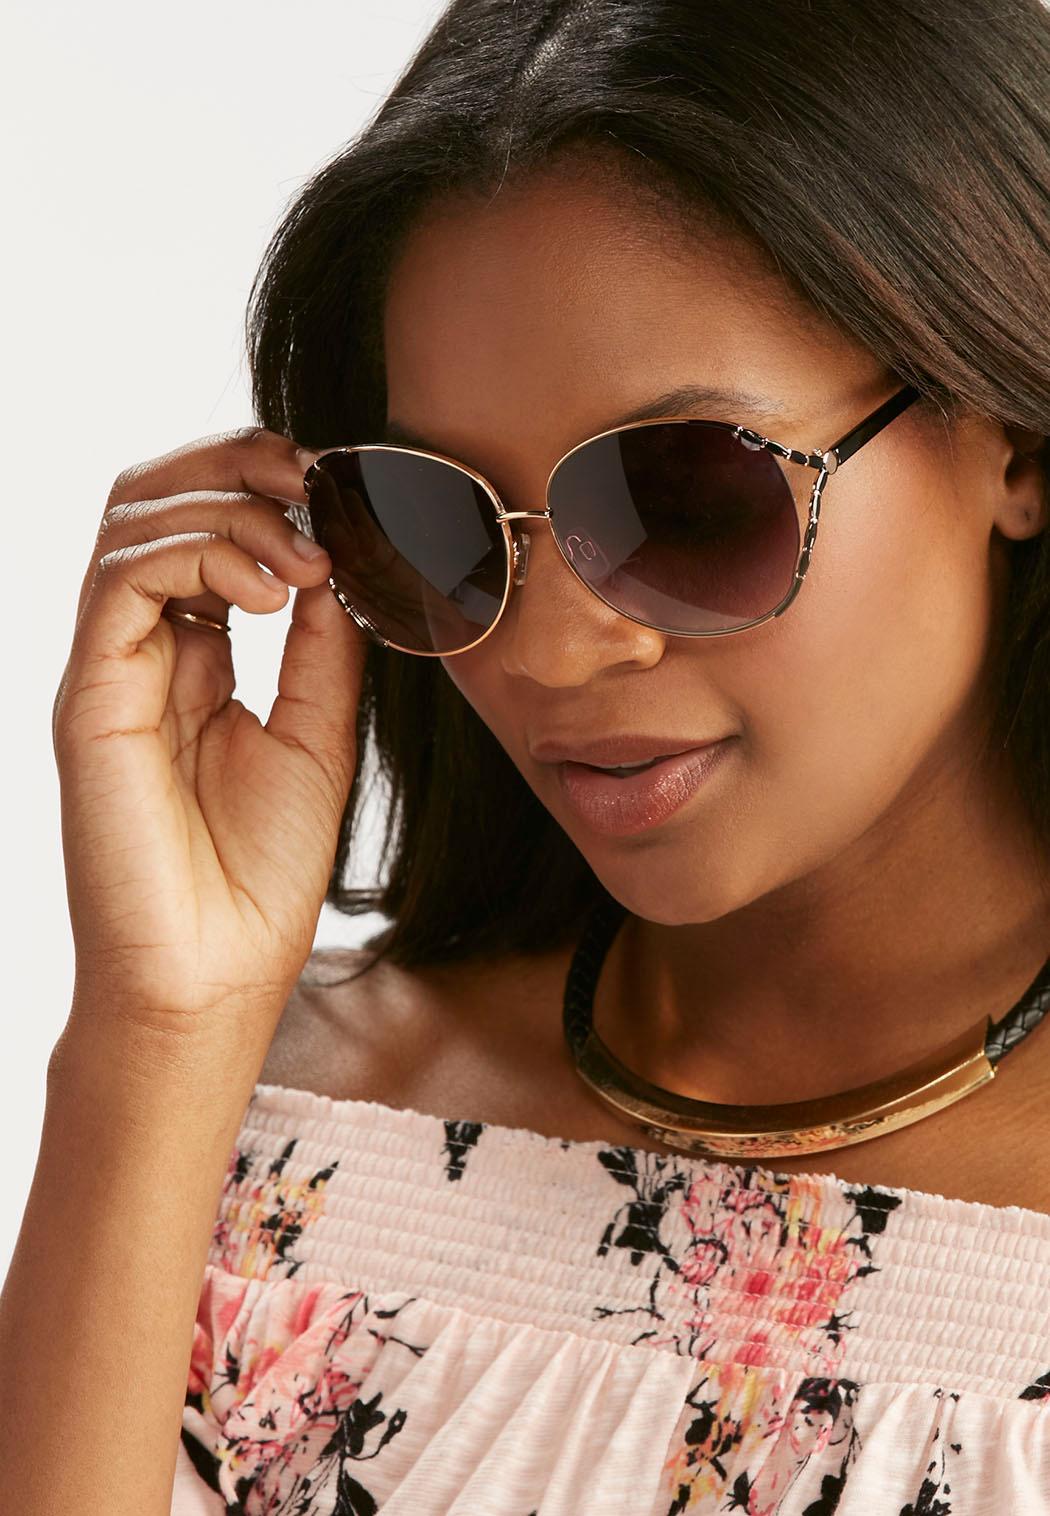 Sunglasses Cutout  cutout side round sunglasses sunglasses cato fashions